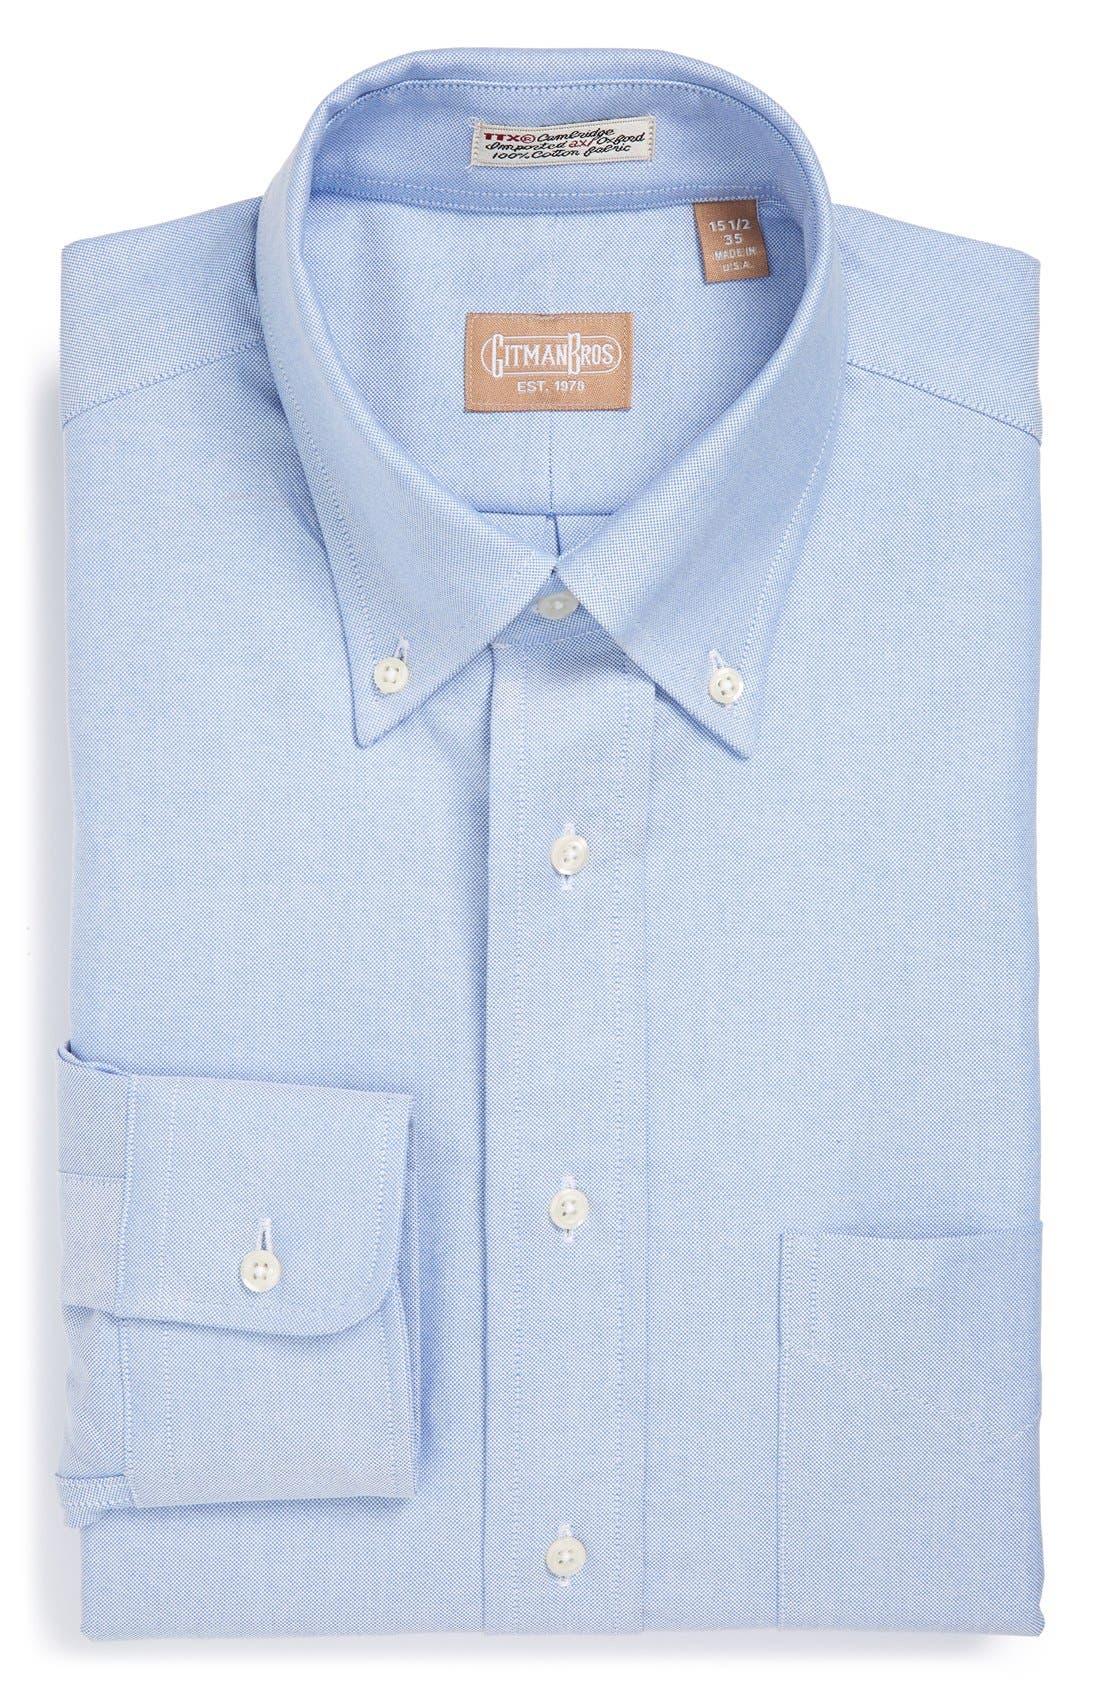 Alternate Image 1 Selected - Gitman 'Cambridge Oxford' Regular Fit Dress Shirt